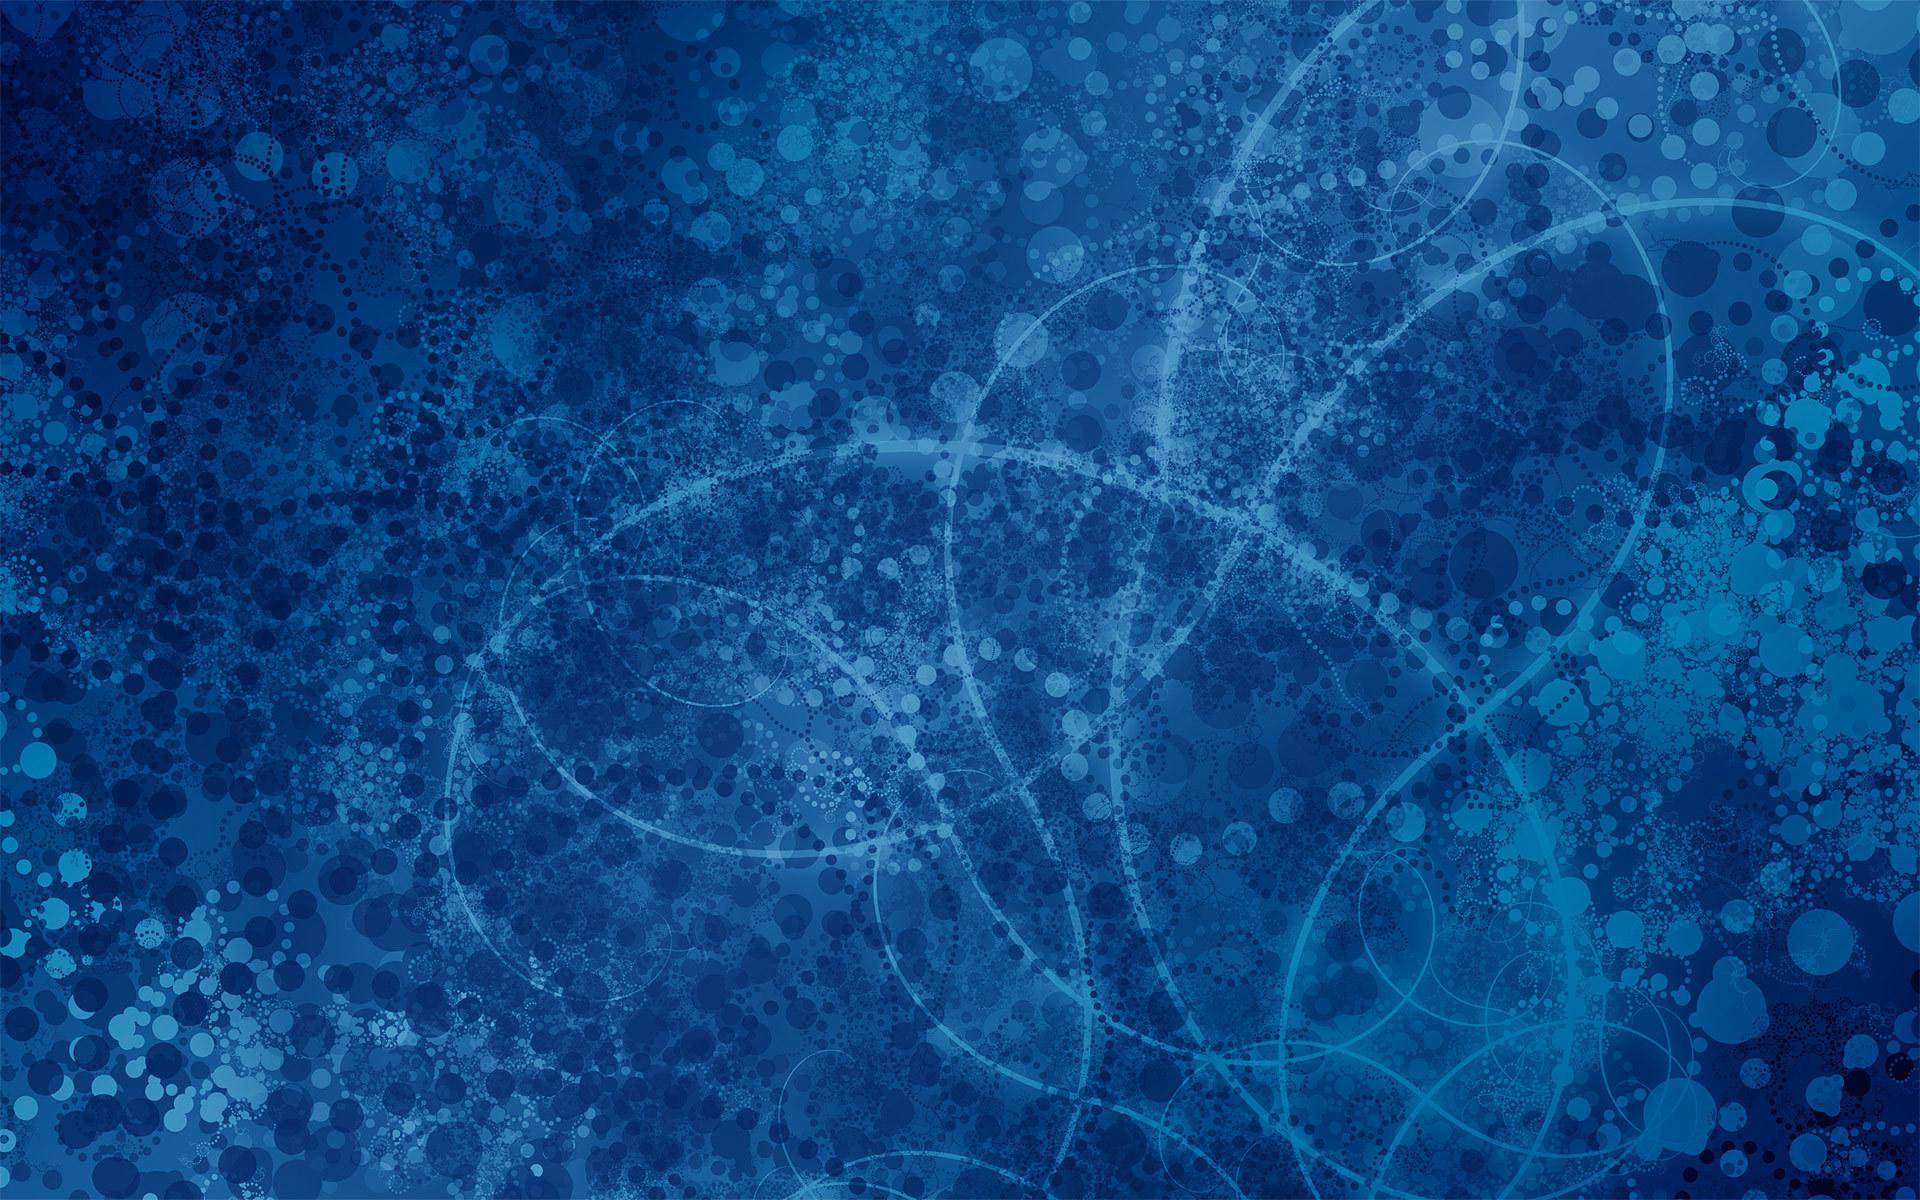 Blue Background HD Wallpaper 1920x1200